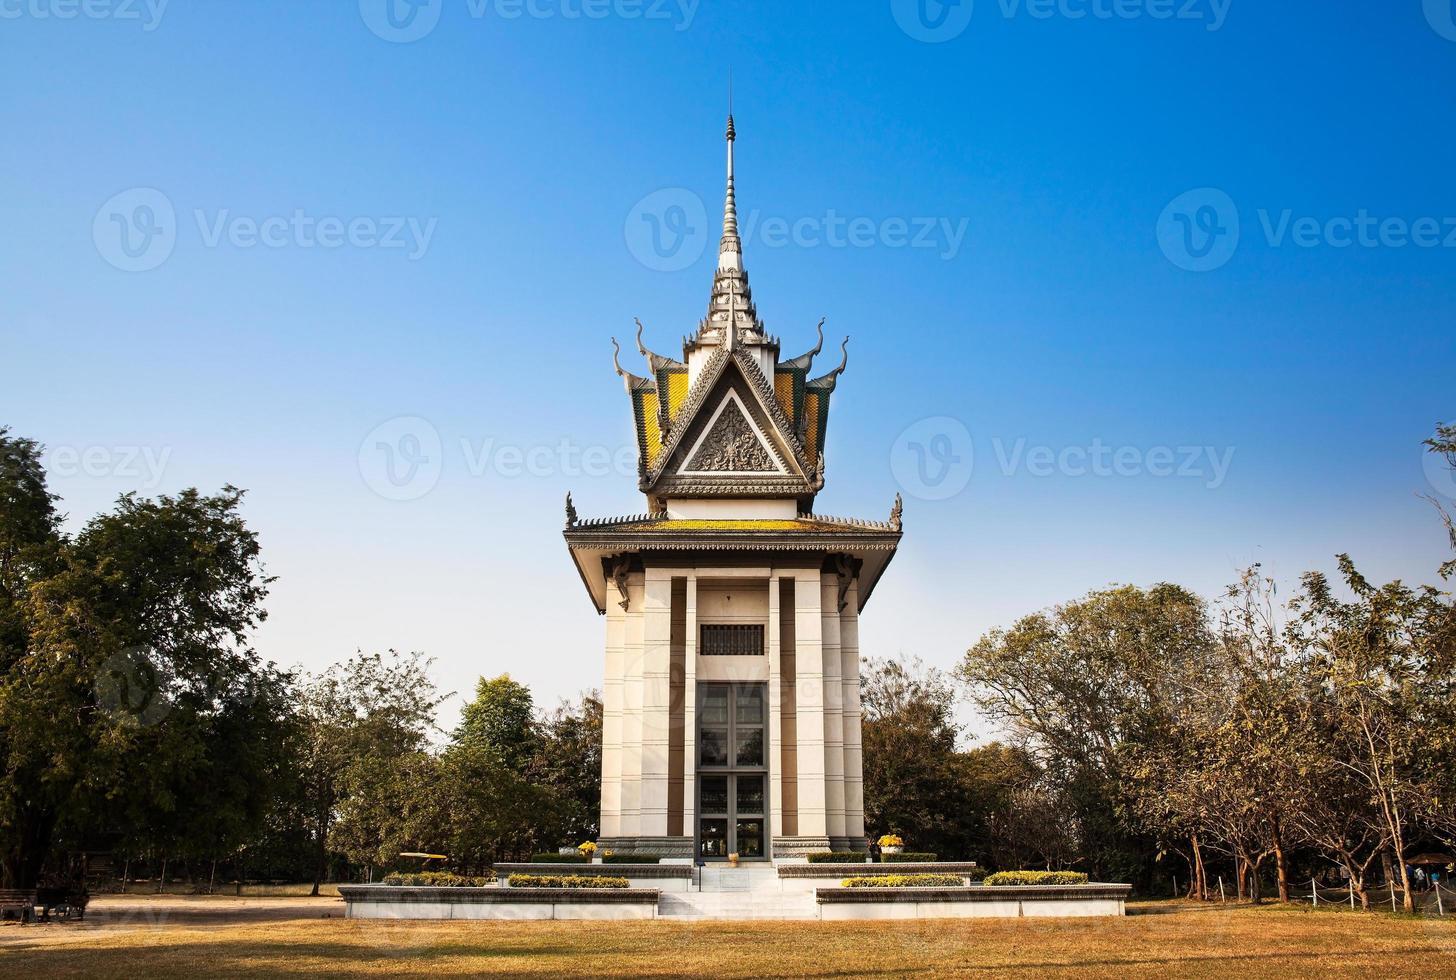 das Schlachtfeld, choeung ek, phnom penh, Kambodscha. foto